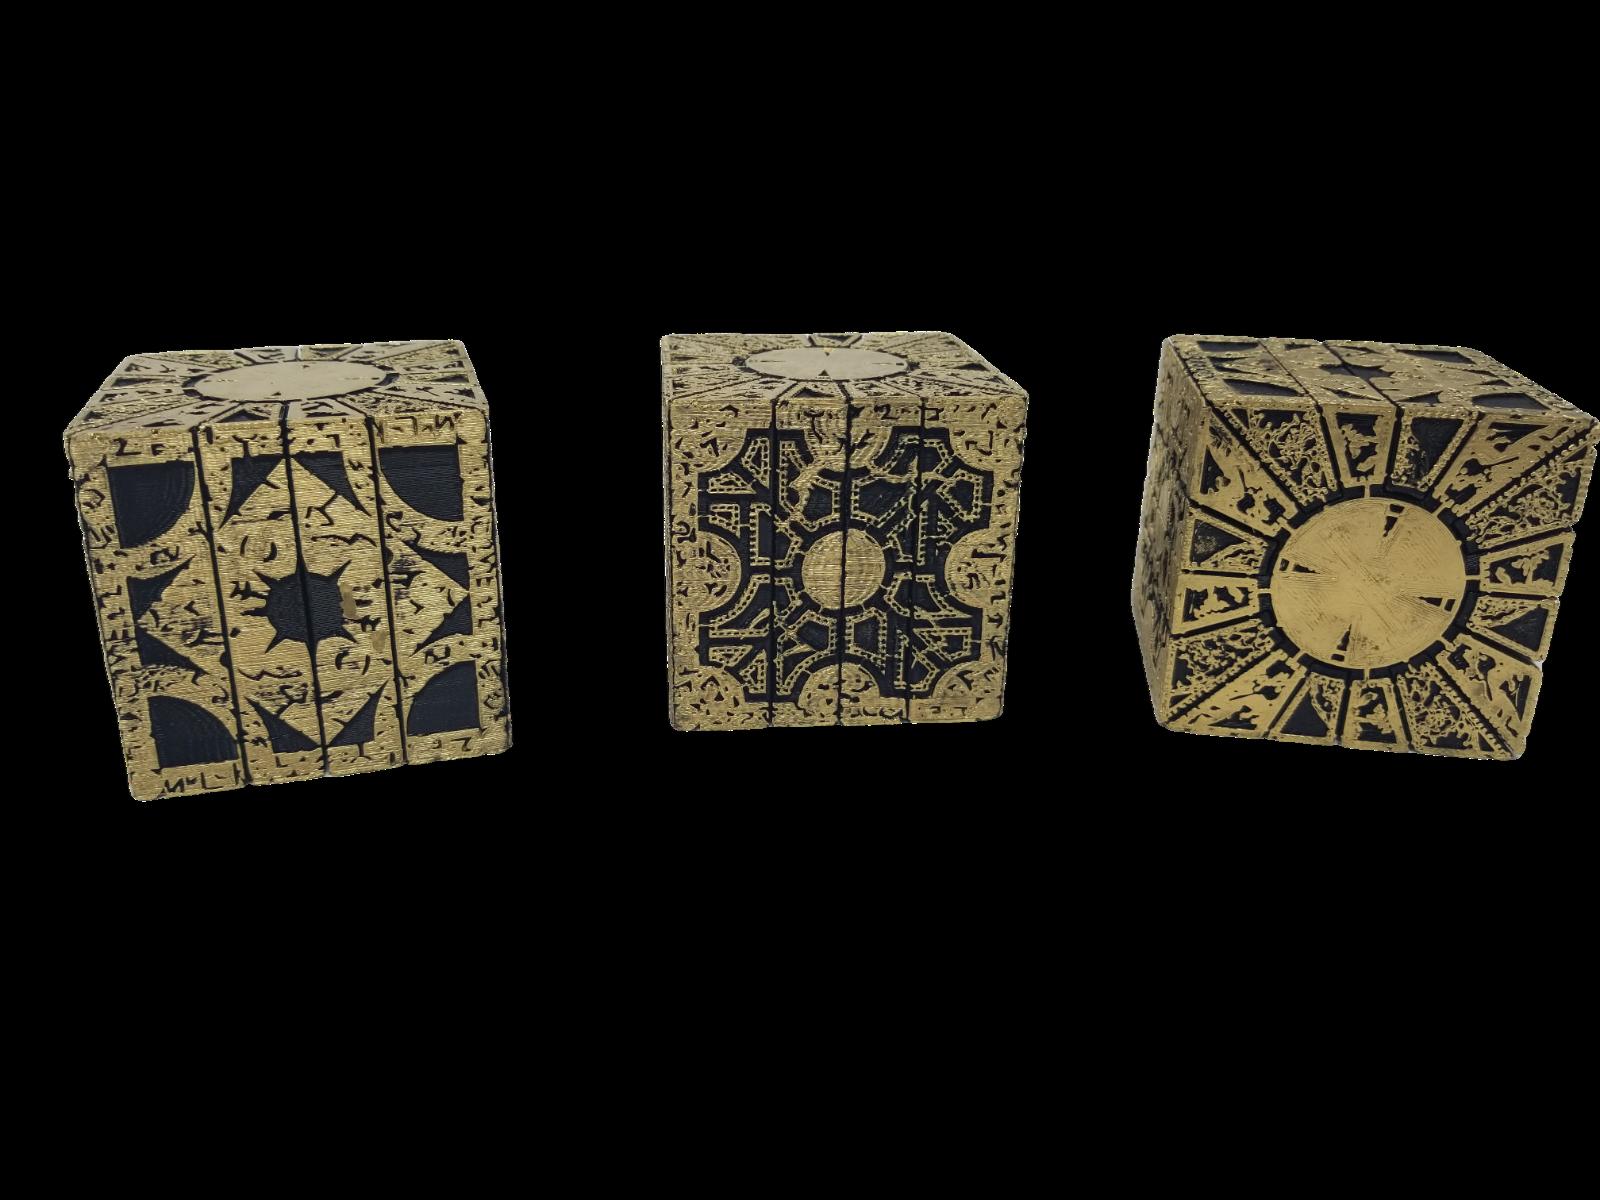 Hellraiser Cube Puzzle Box Lament Configuration  Functional Pinhead Prop Horror 6